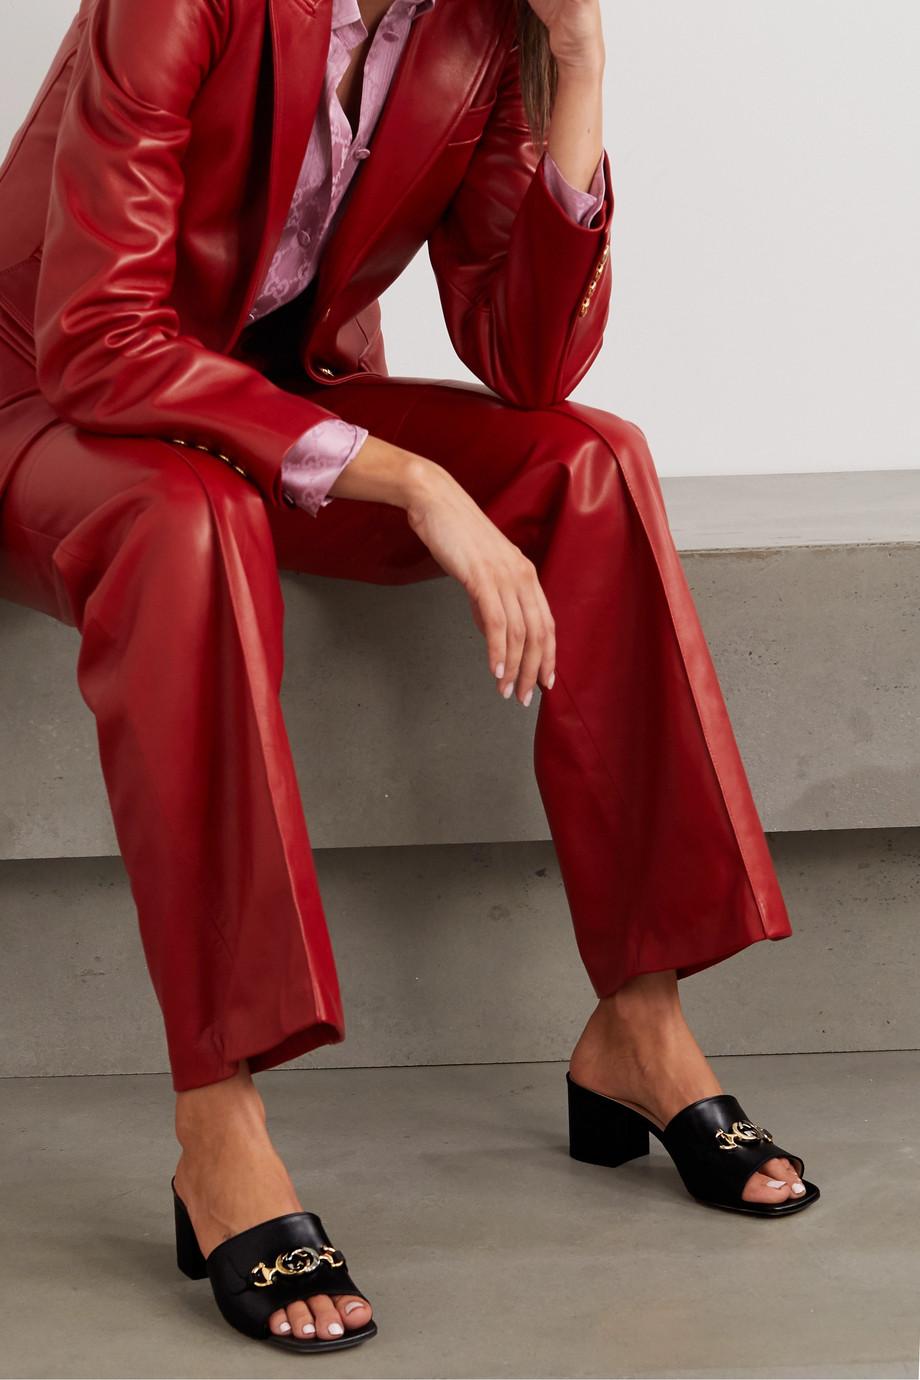 Gucci Zumi embellished leather mules